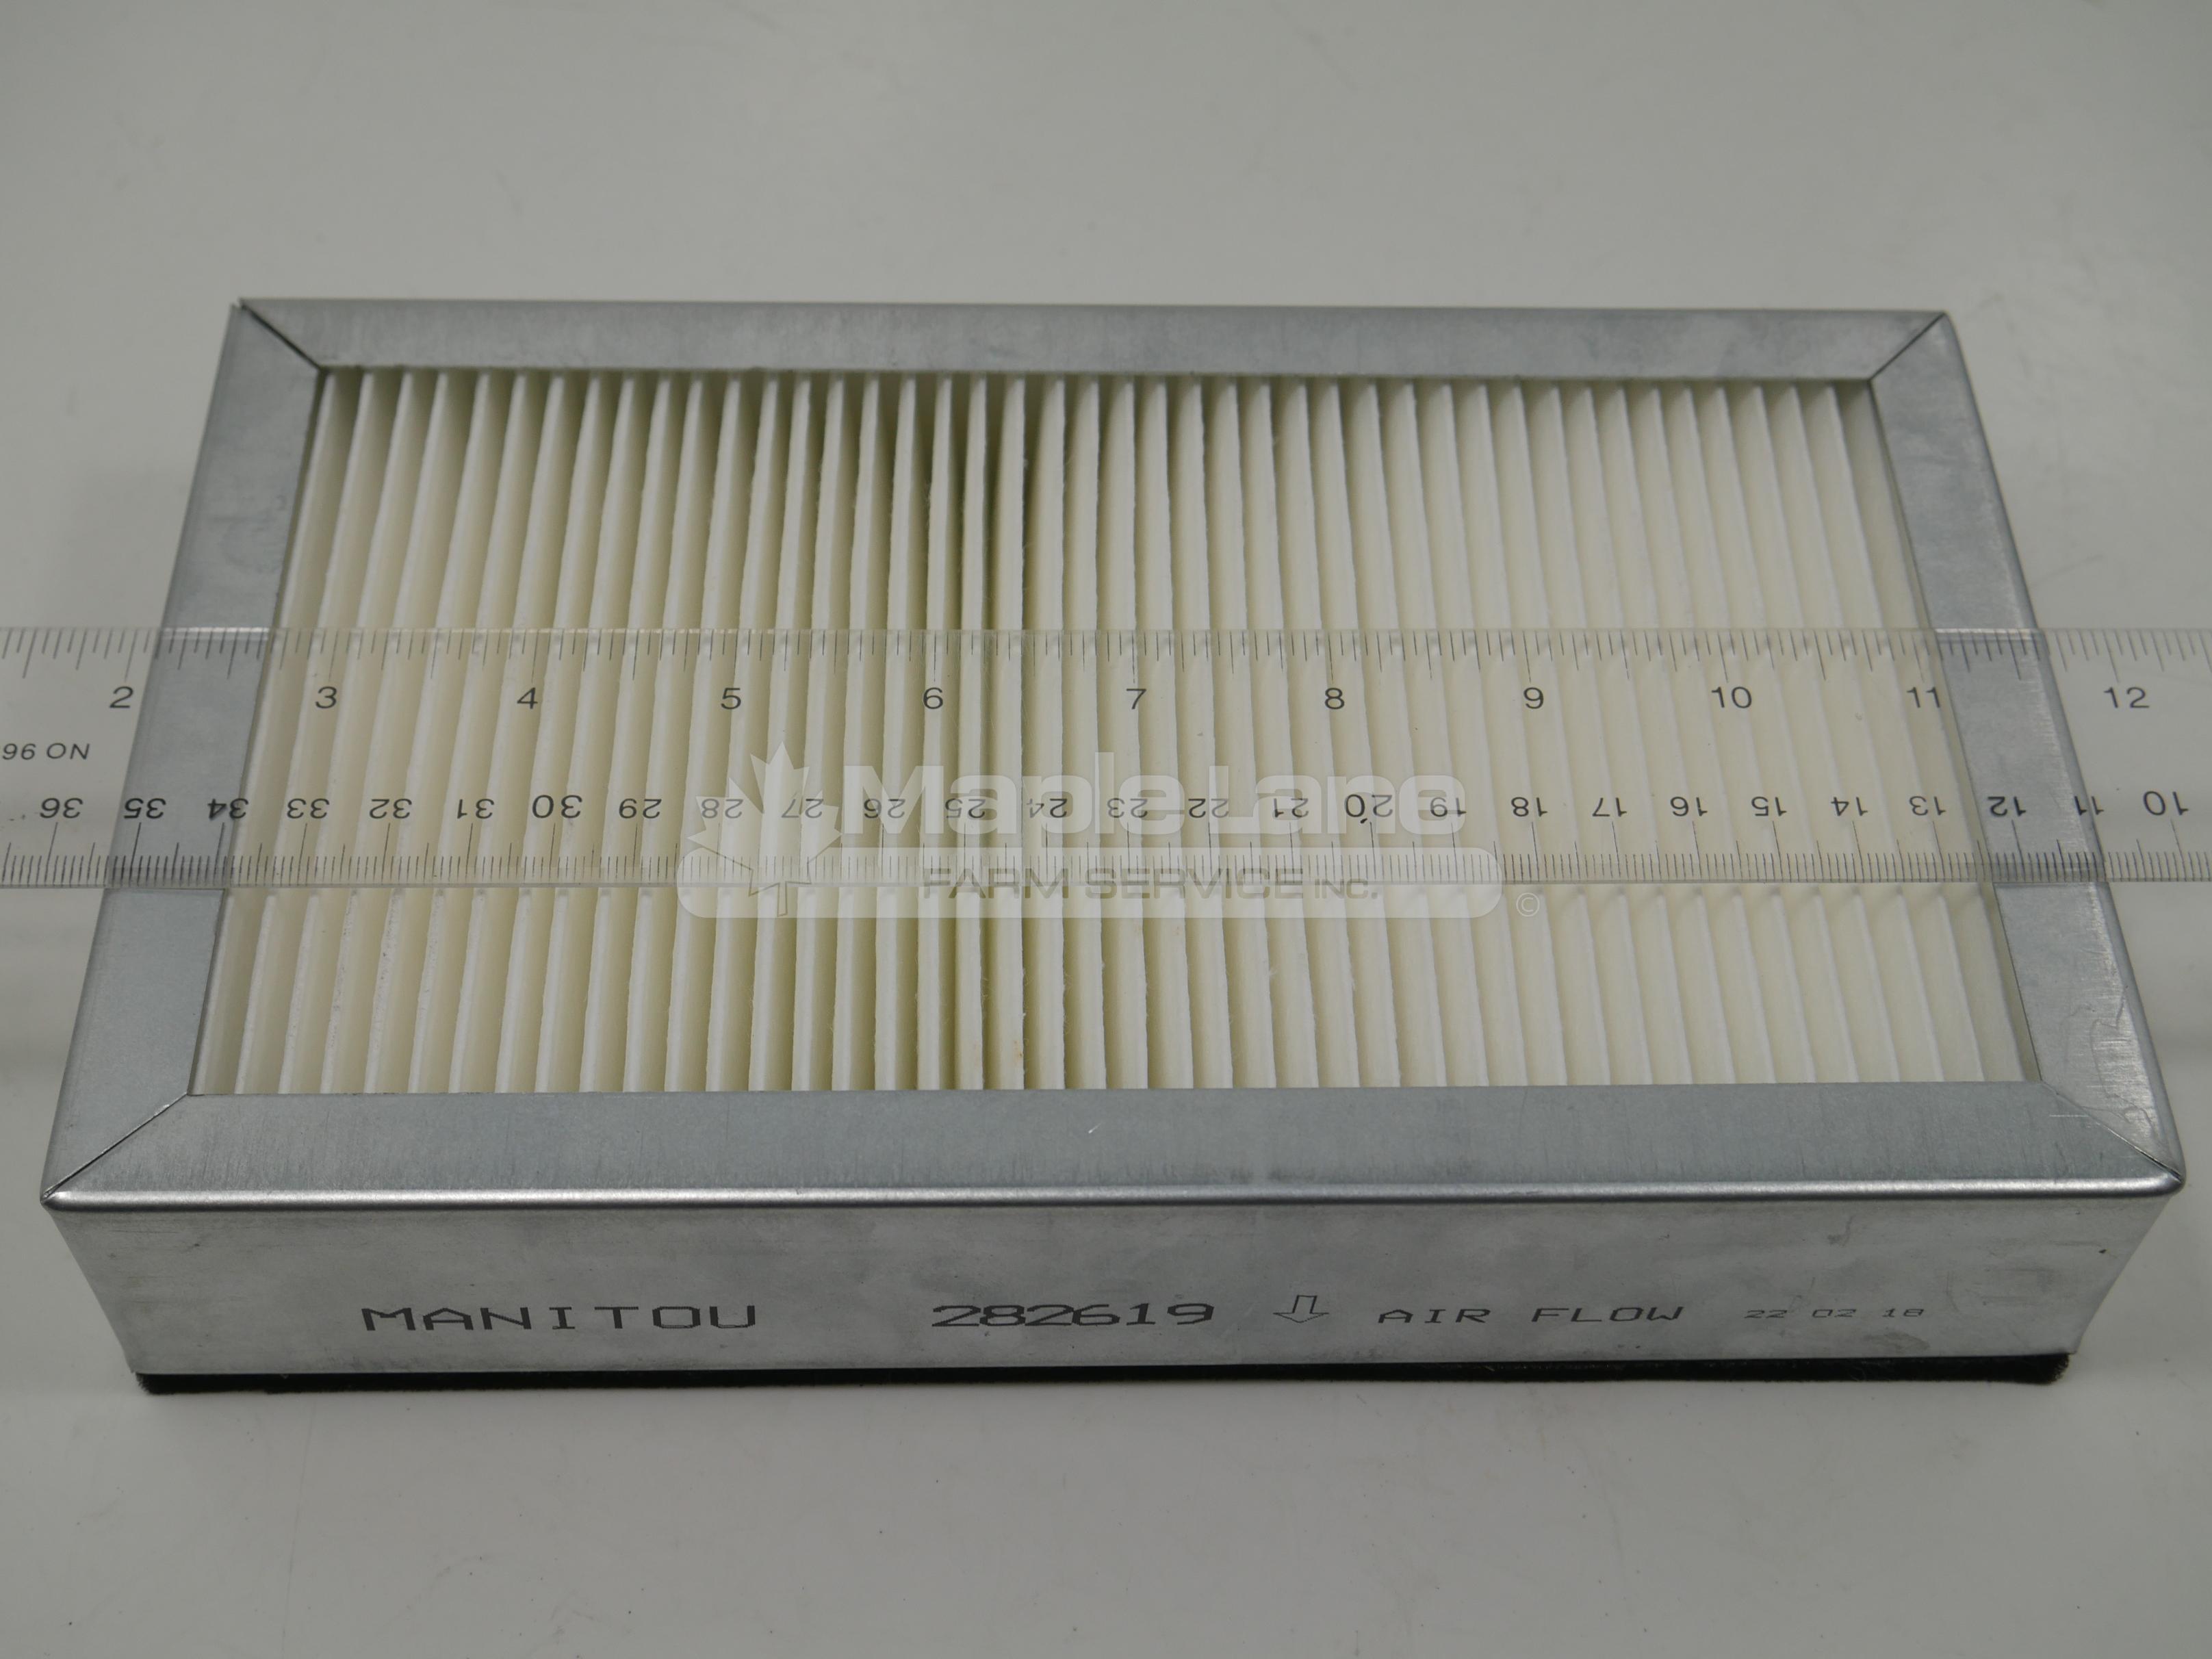 J282619 Heating Filter